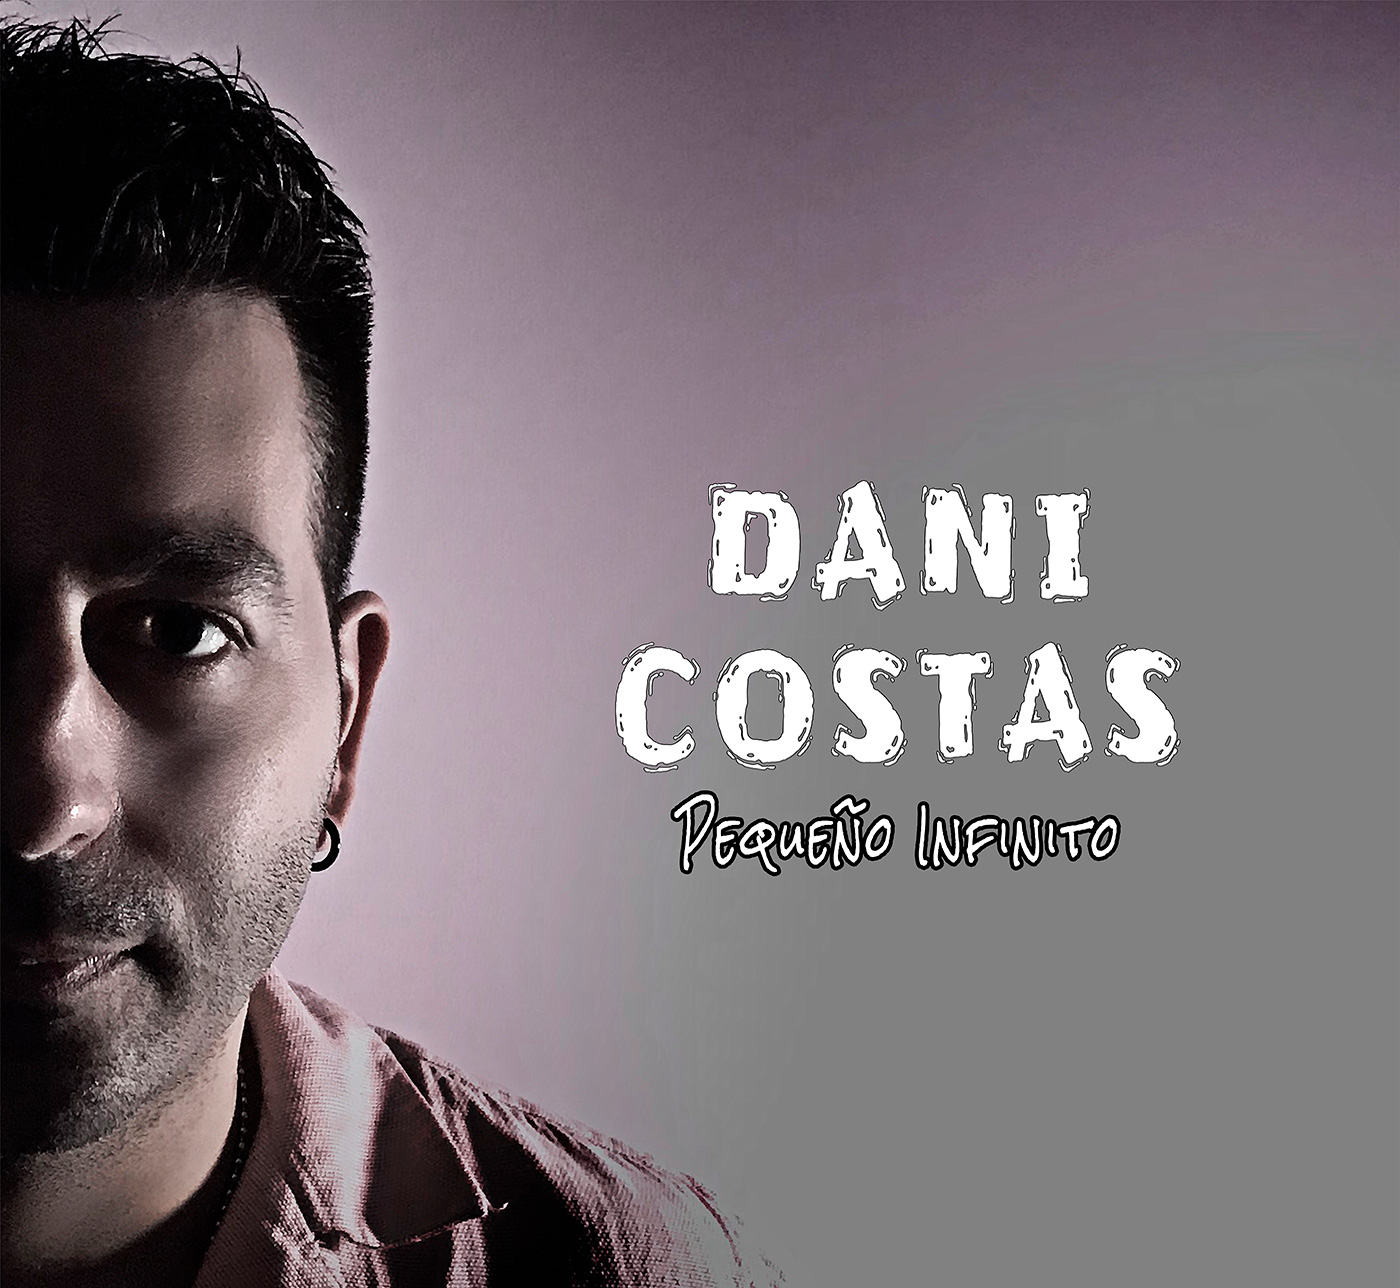 Dani Costas